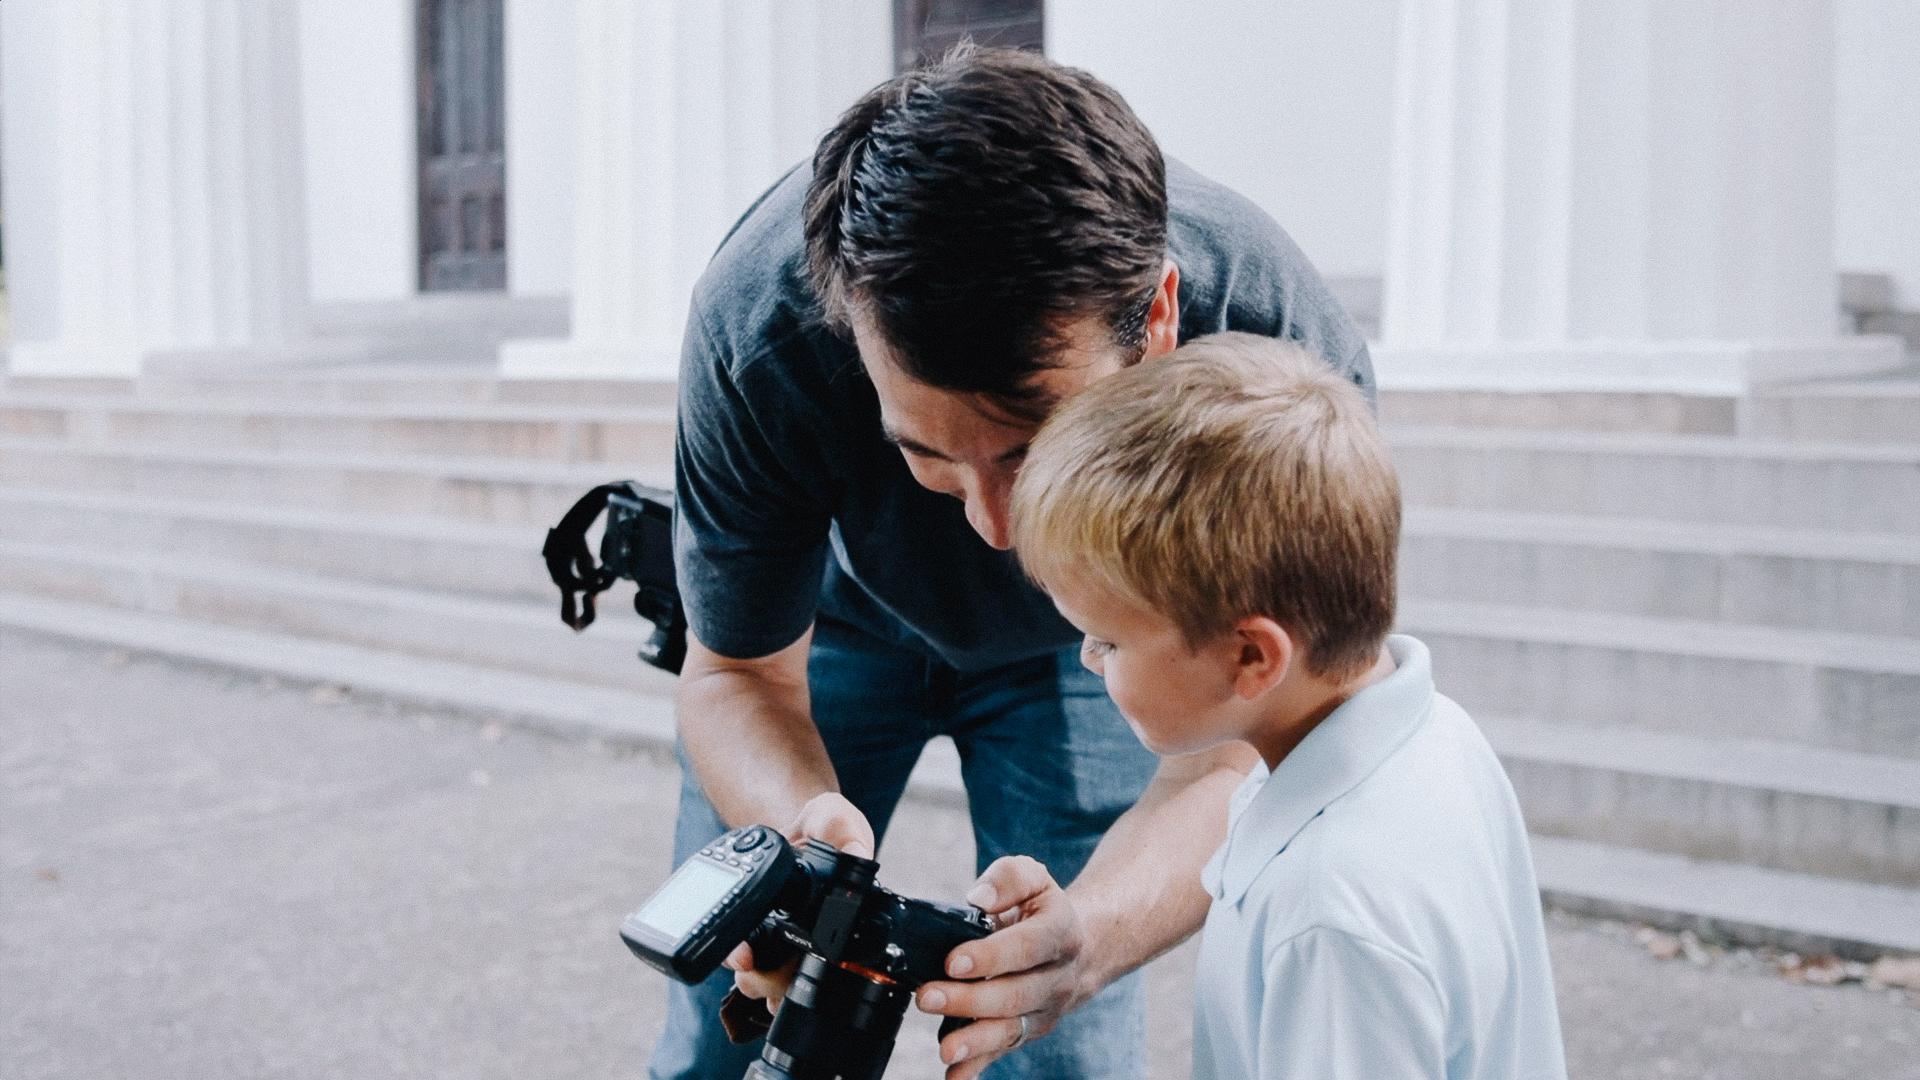 Professional Wedding and portrait photographer Phillip Blume on set in Georgia